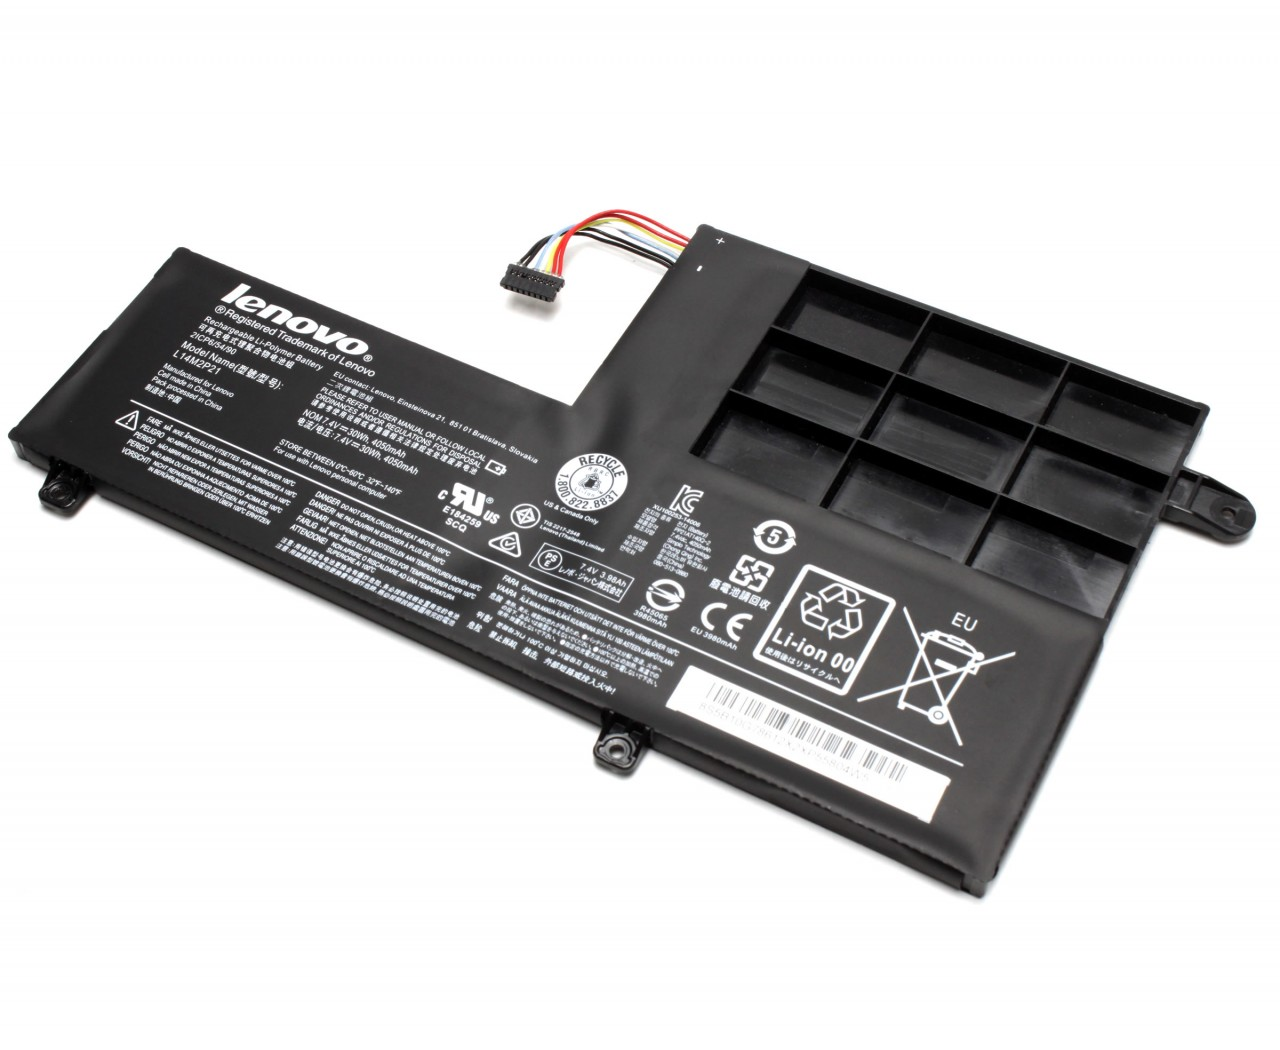 Baterie Lenovo IdeaPad 300S-14ISK Originala 30Wh/4050mAh 2 celule imagine powerlaptop.ro 2021